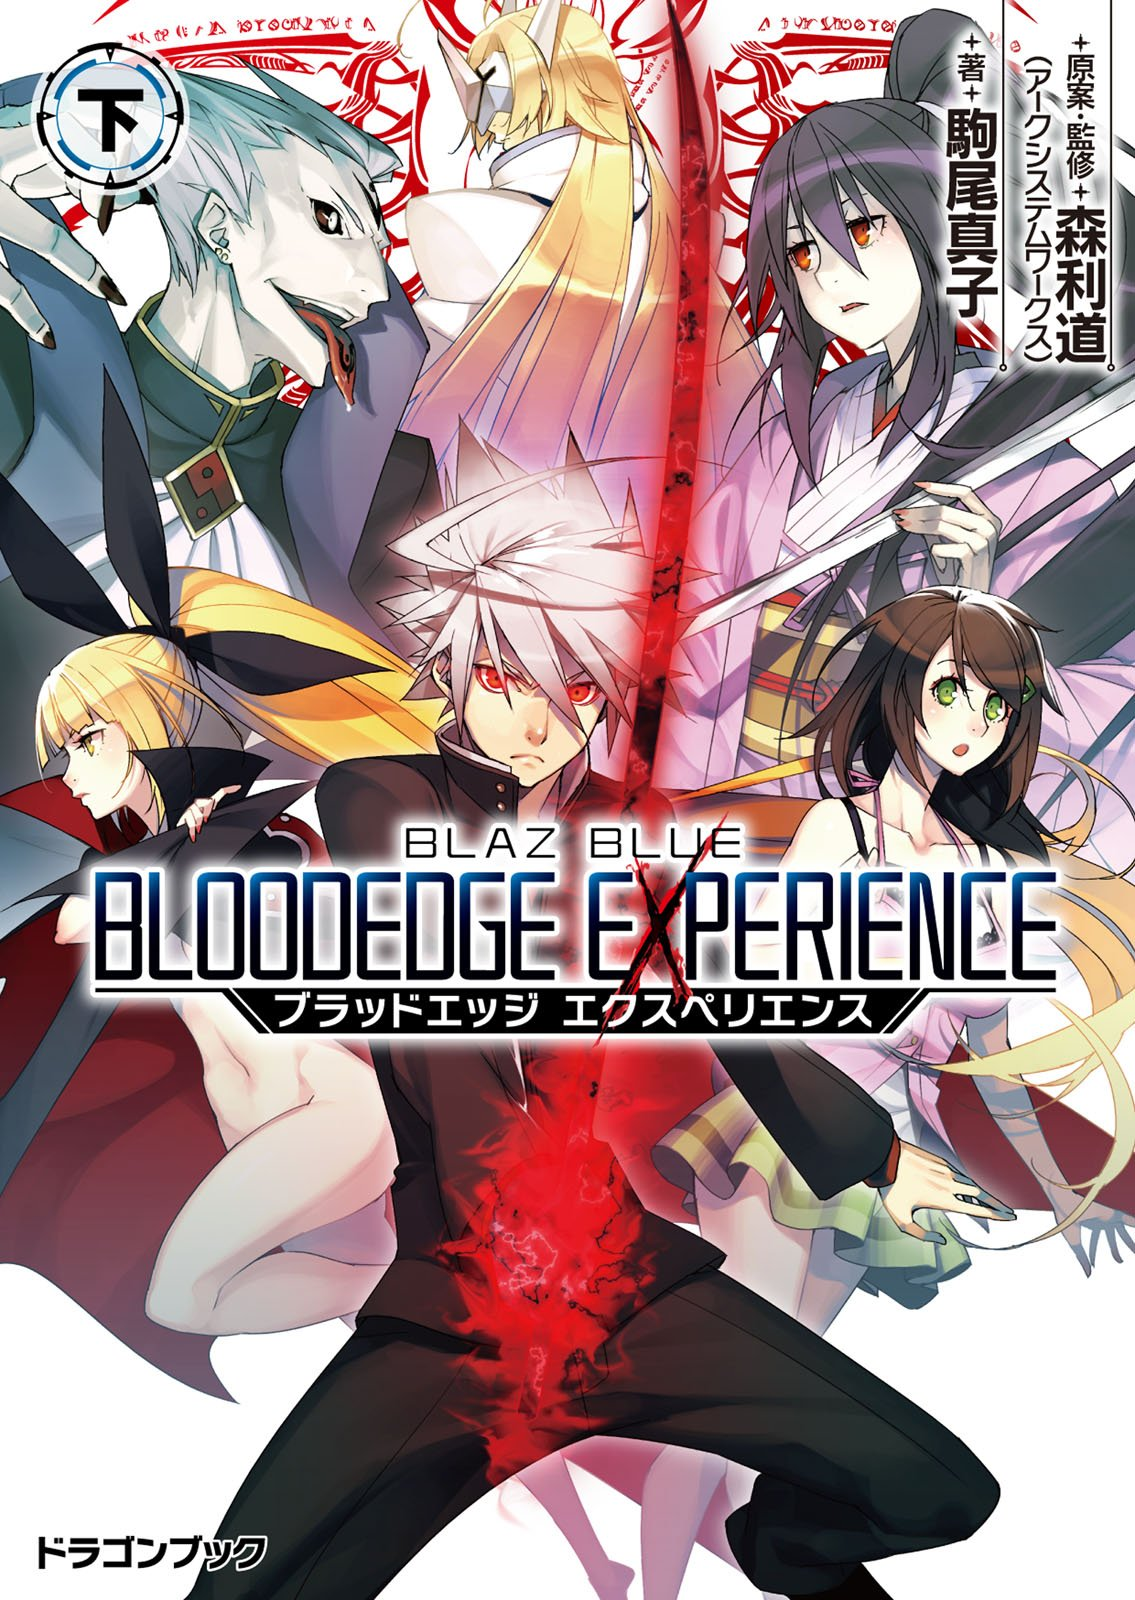 BlazBlue: Bloodedge Experience - Part 2 (November 2014)